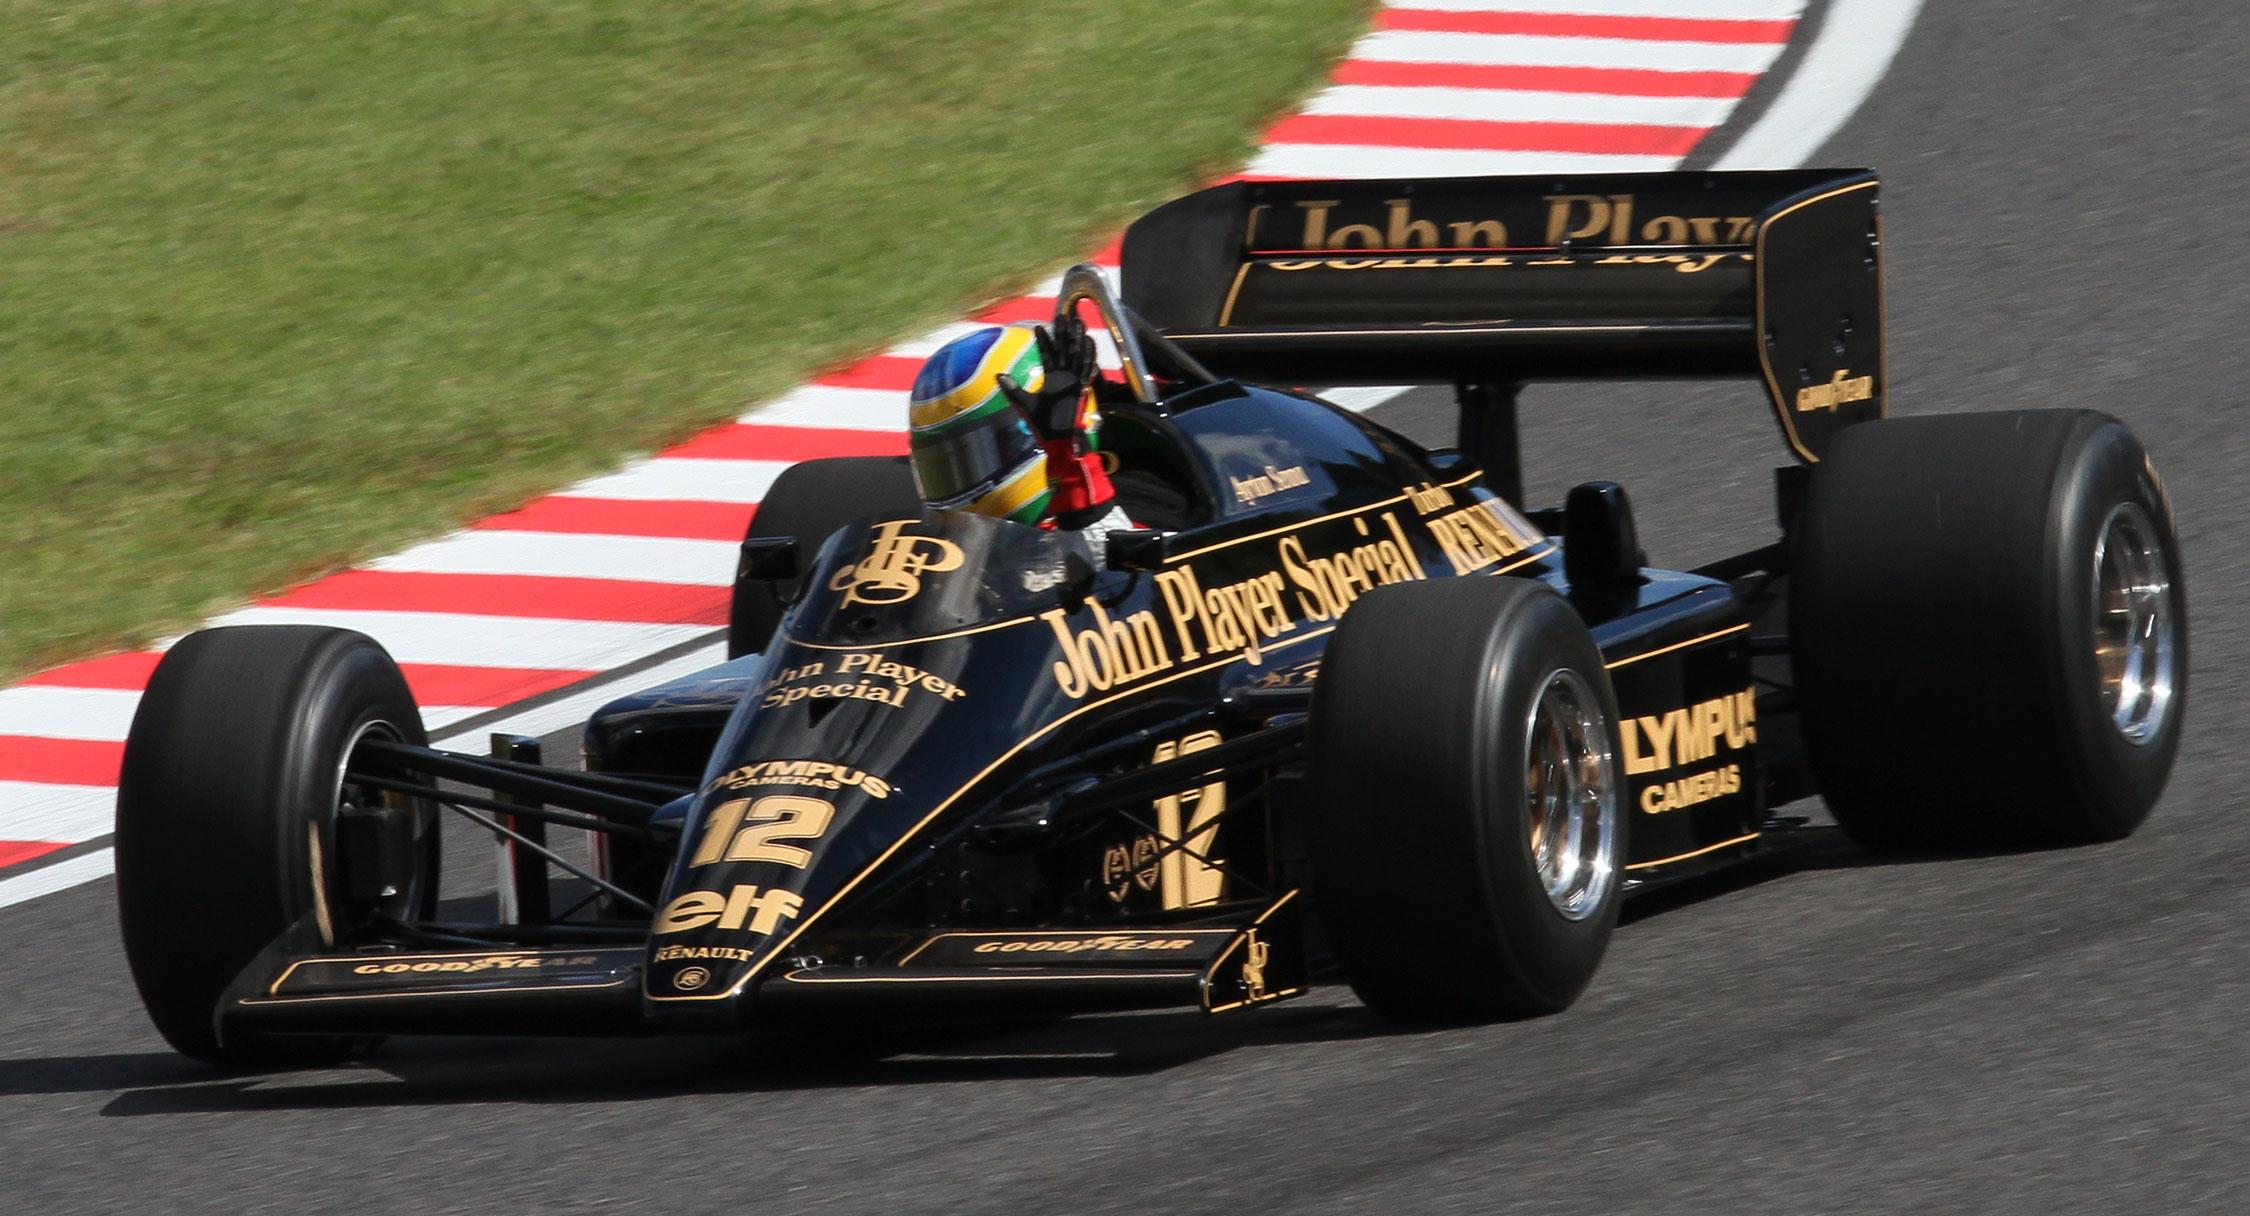 Bruno Senna driving his uncle's Lotus 97T